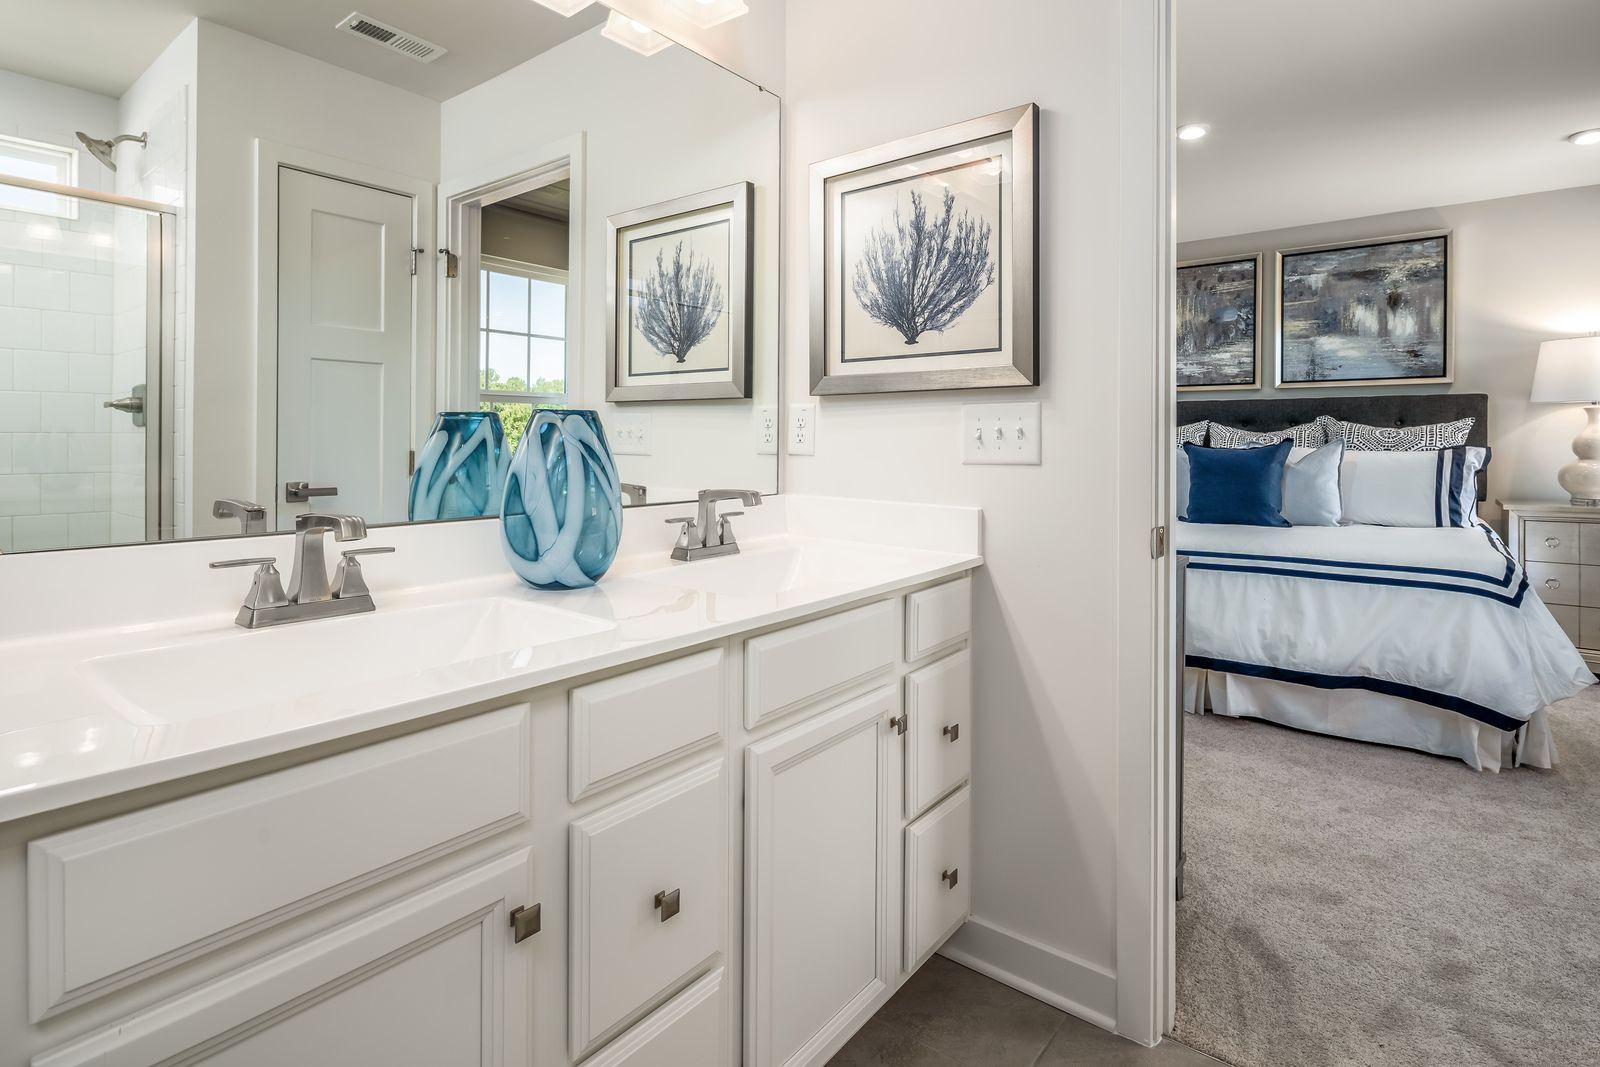 Bathroom featured in the Mendelssohn By Ryan Homes in Washington, VA